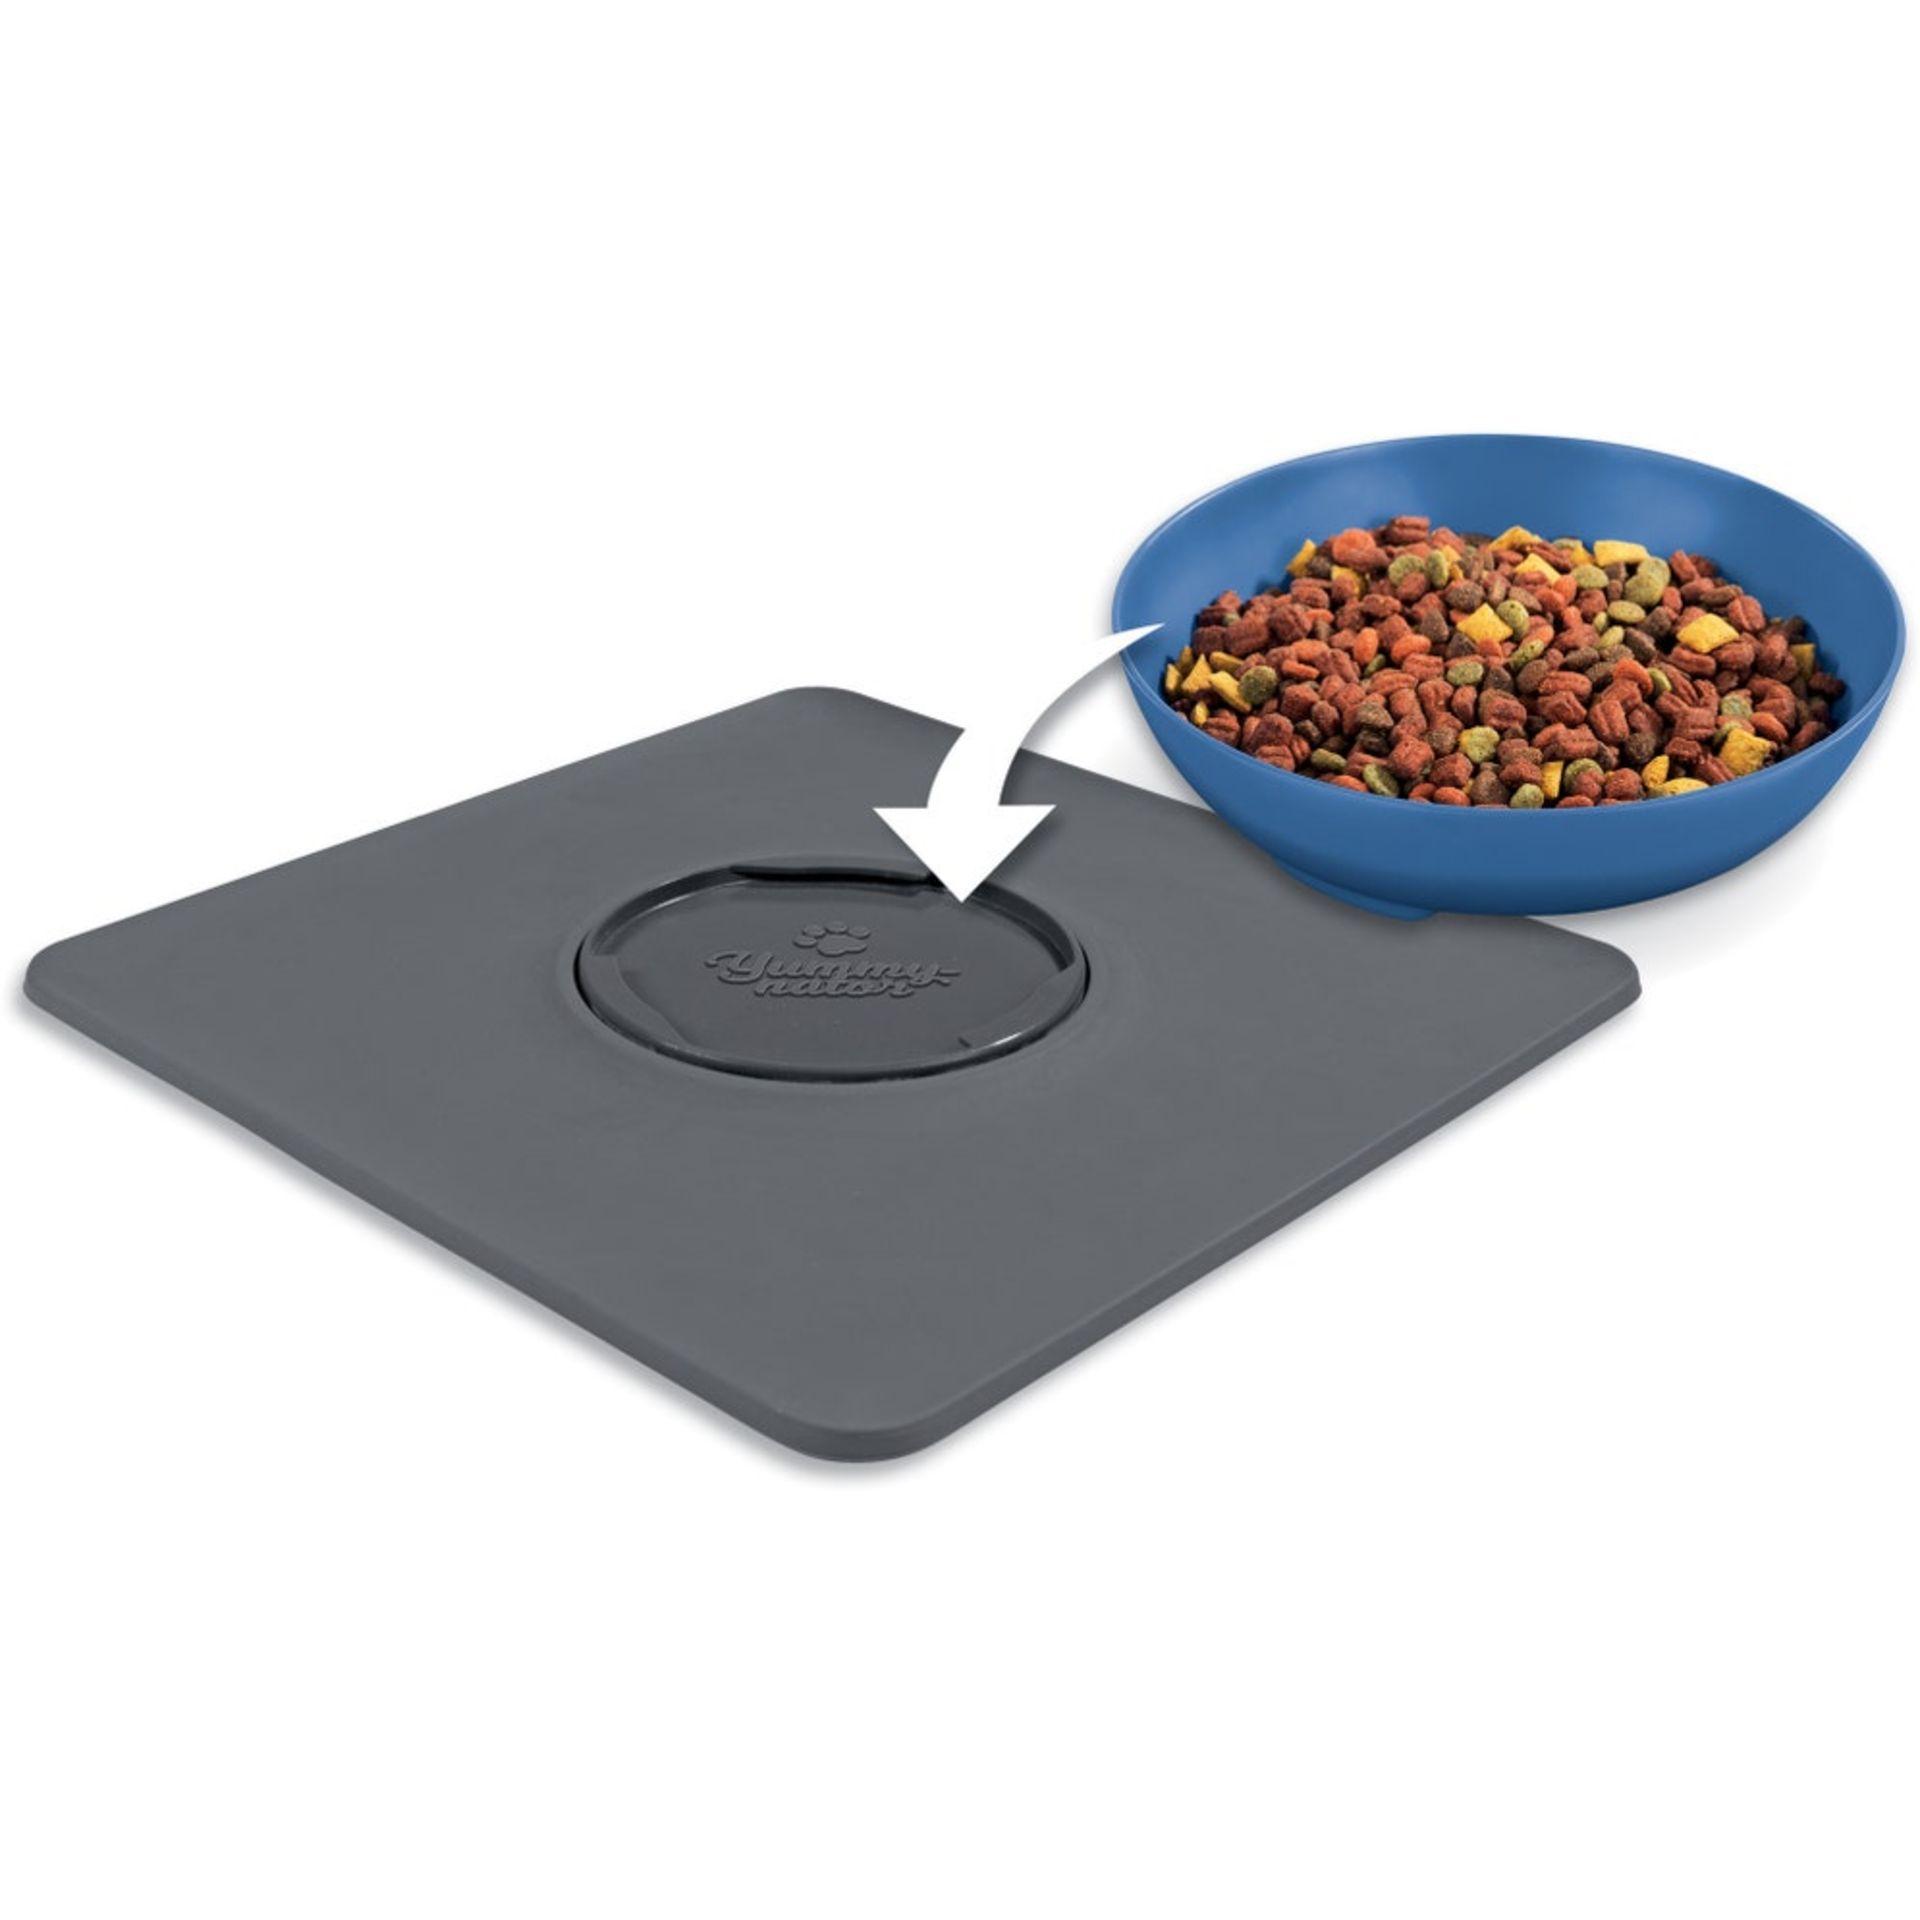 Brand New Jml Twisty Dish Rrp 18.99 - Image 2 of 2